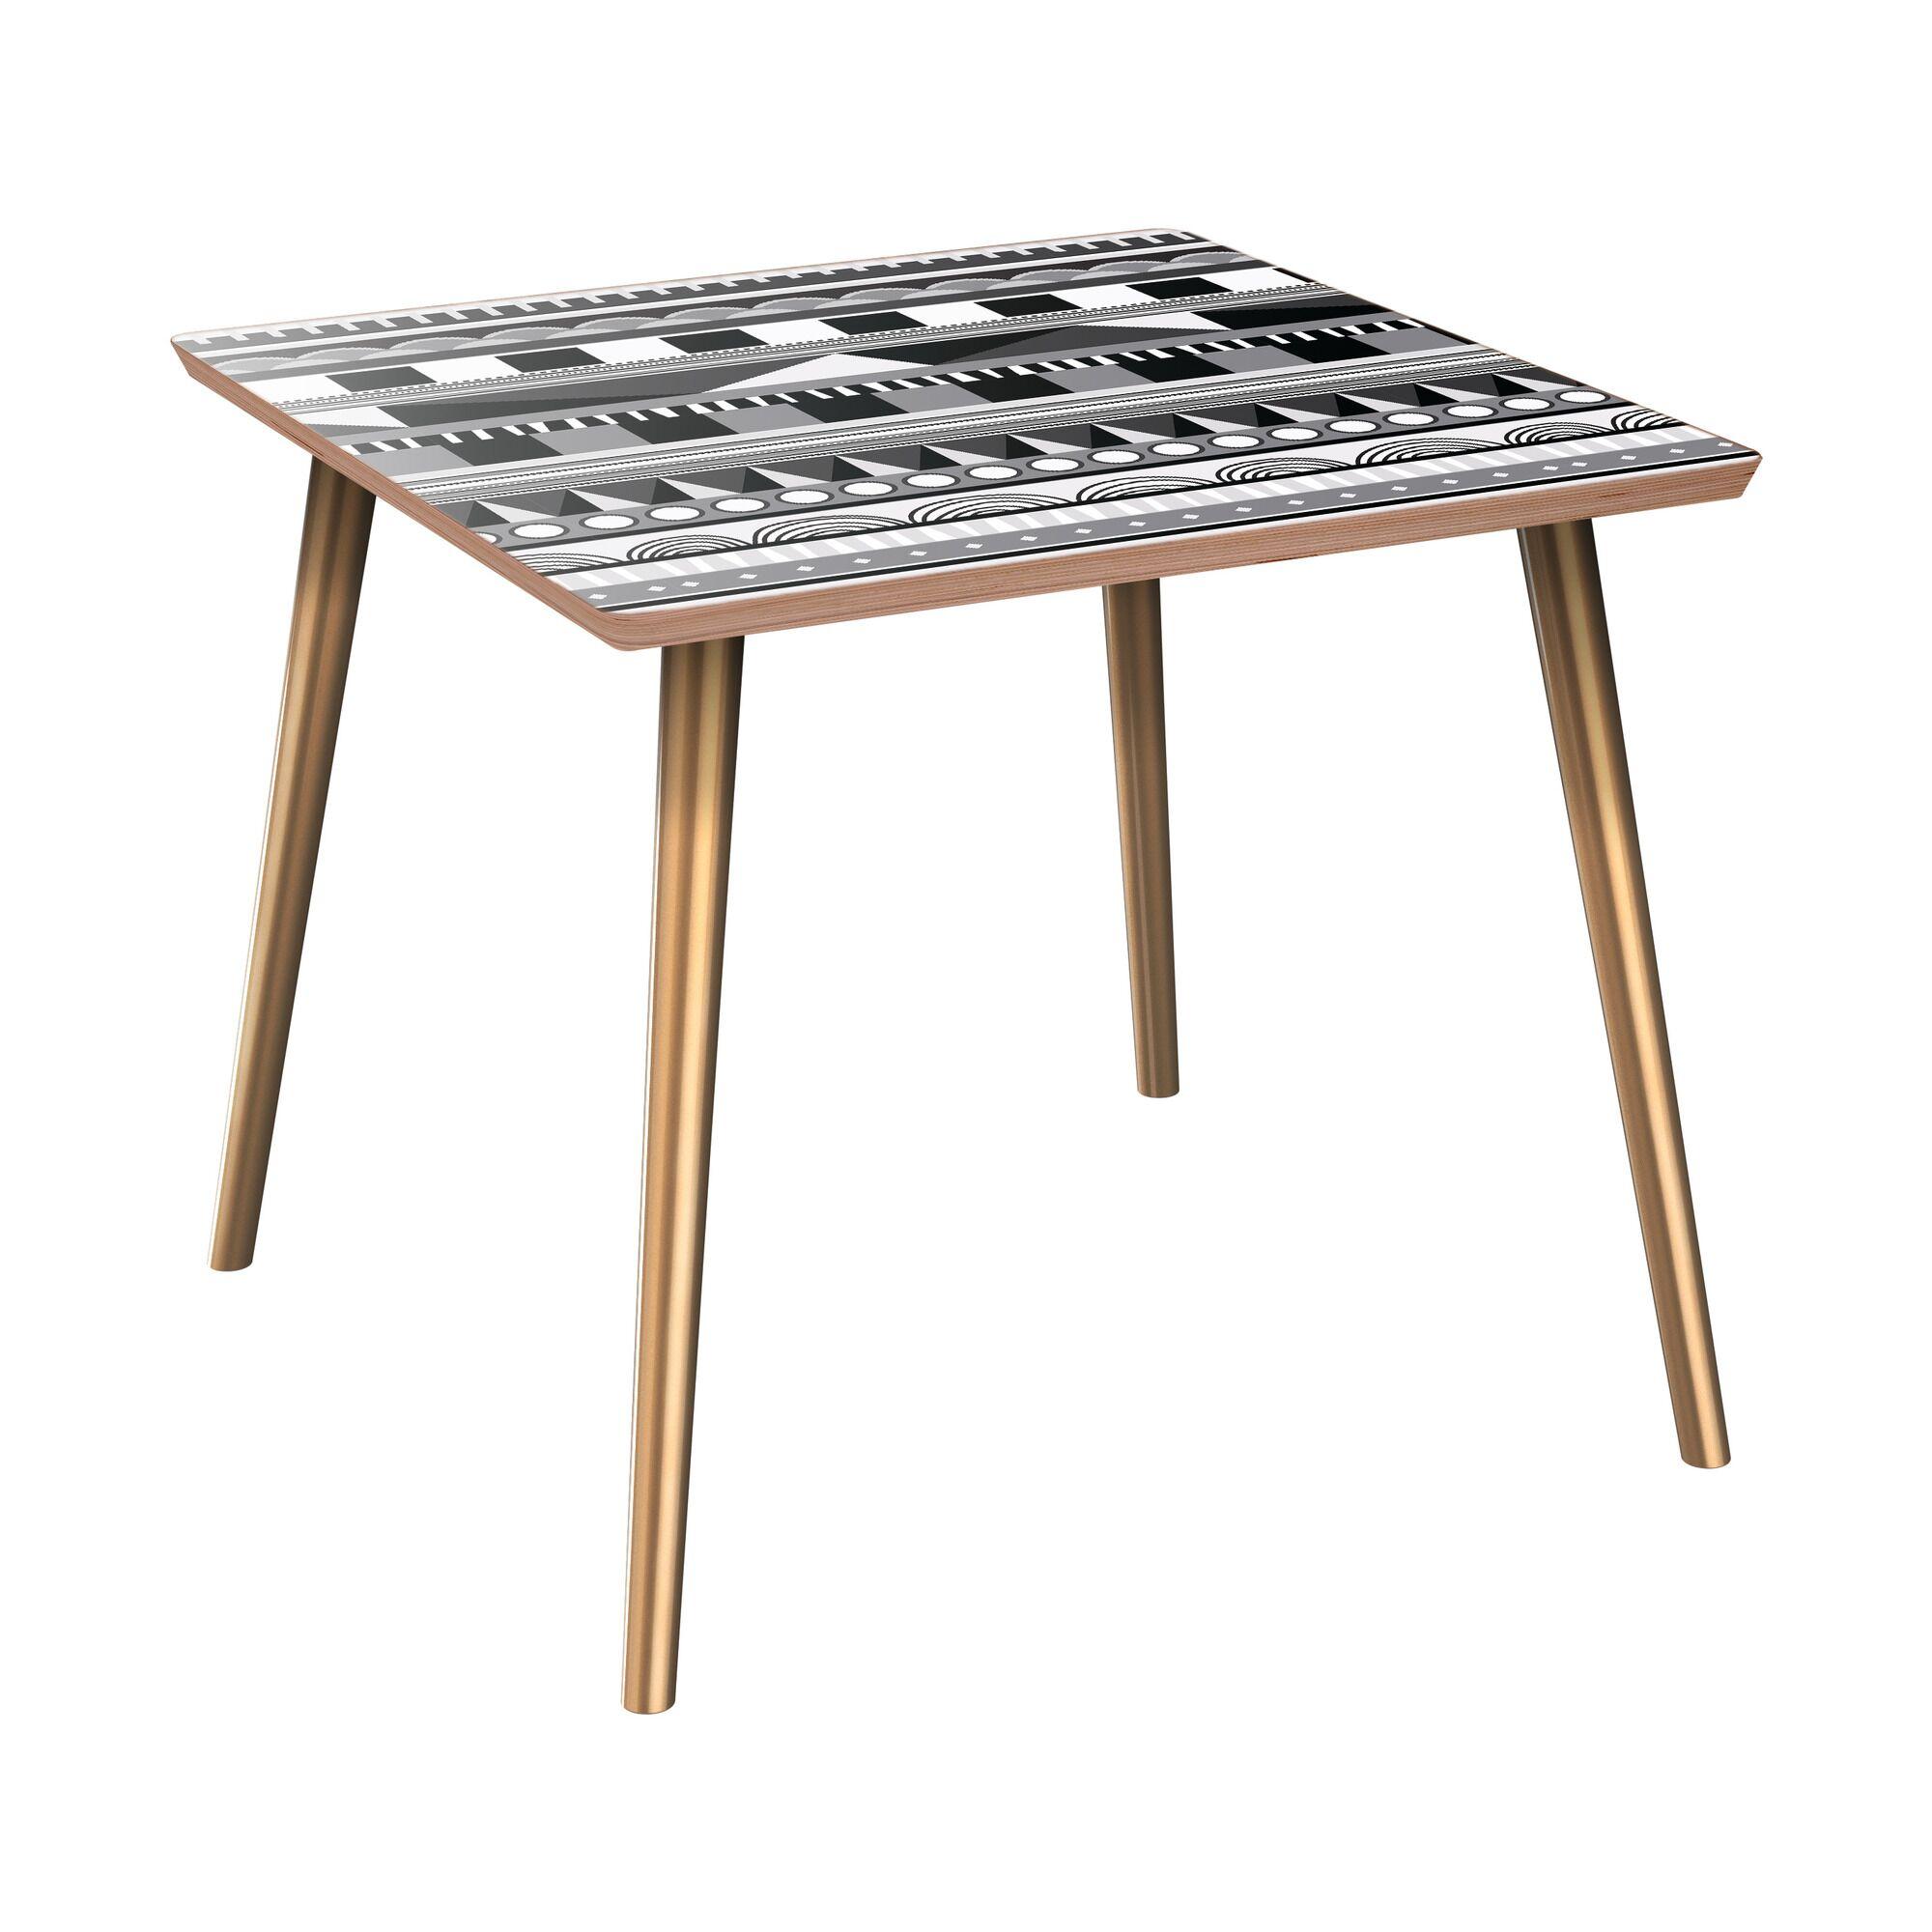 Kenbridge End Table Table Top Color: Walnut, Table Base Color: Brass